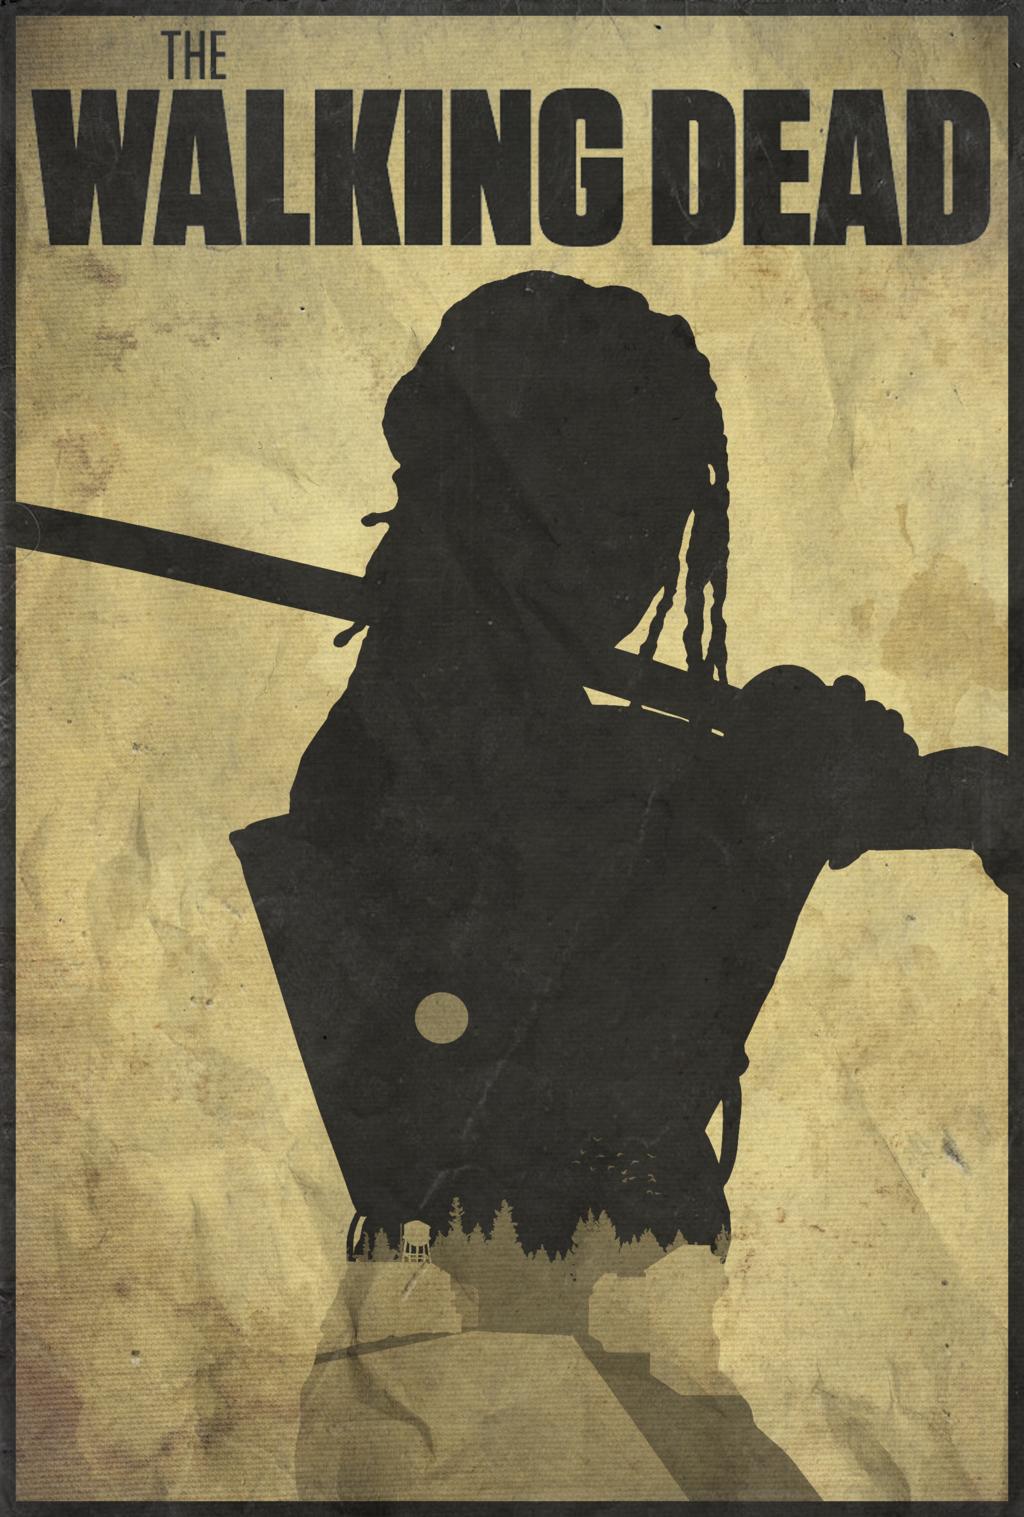 """The Walking Dead: Michonne"". Стоит ли игра свеч? - Изображение 17"